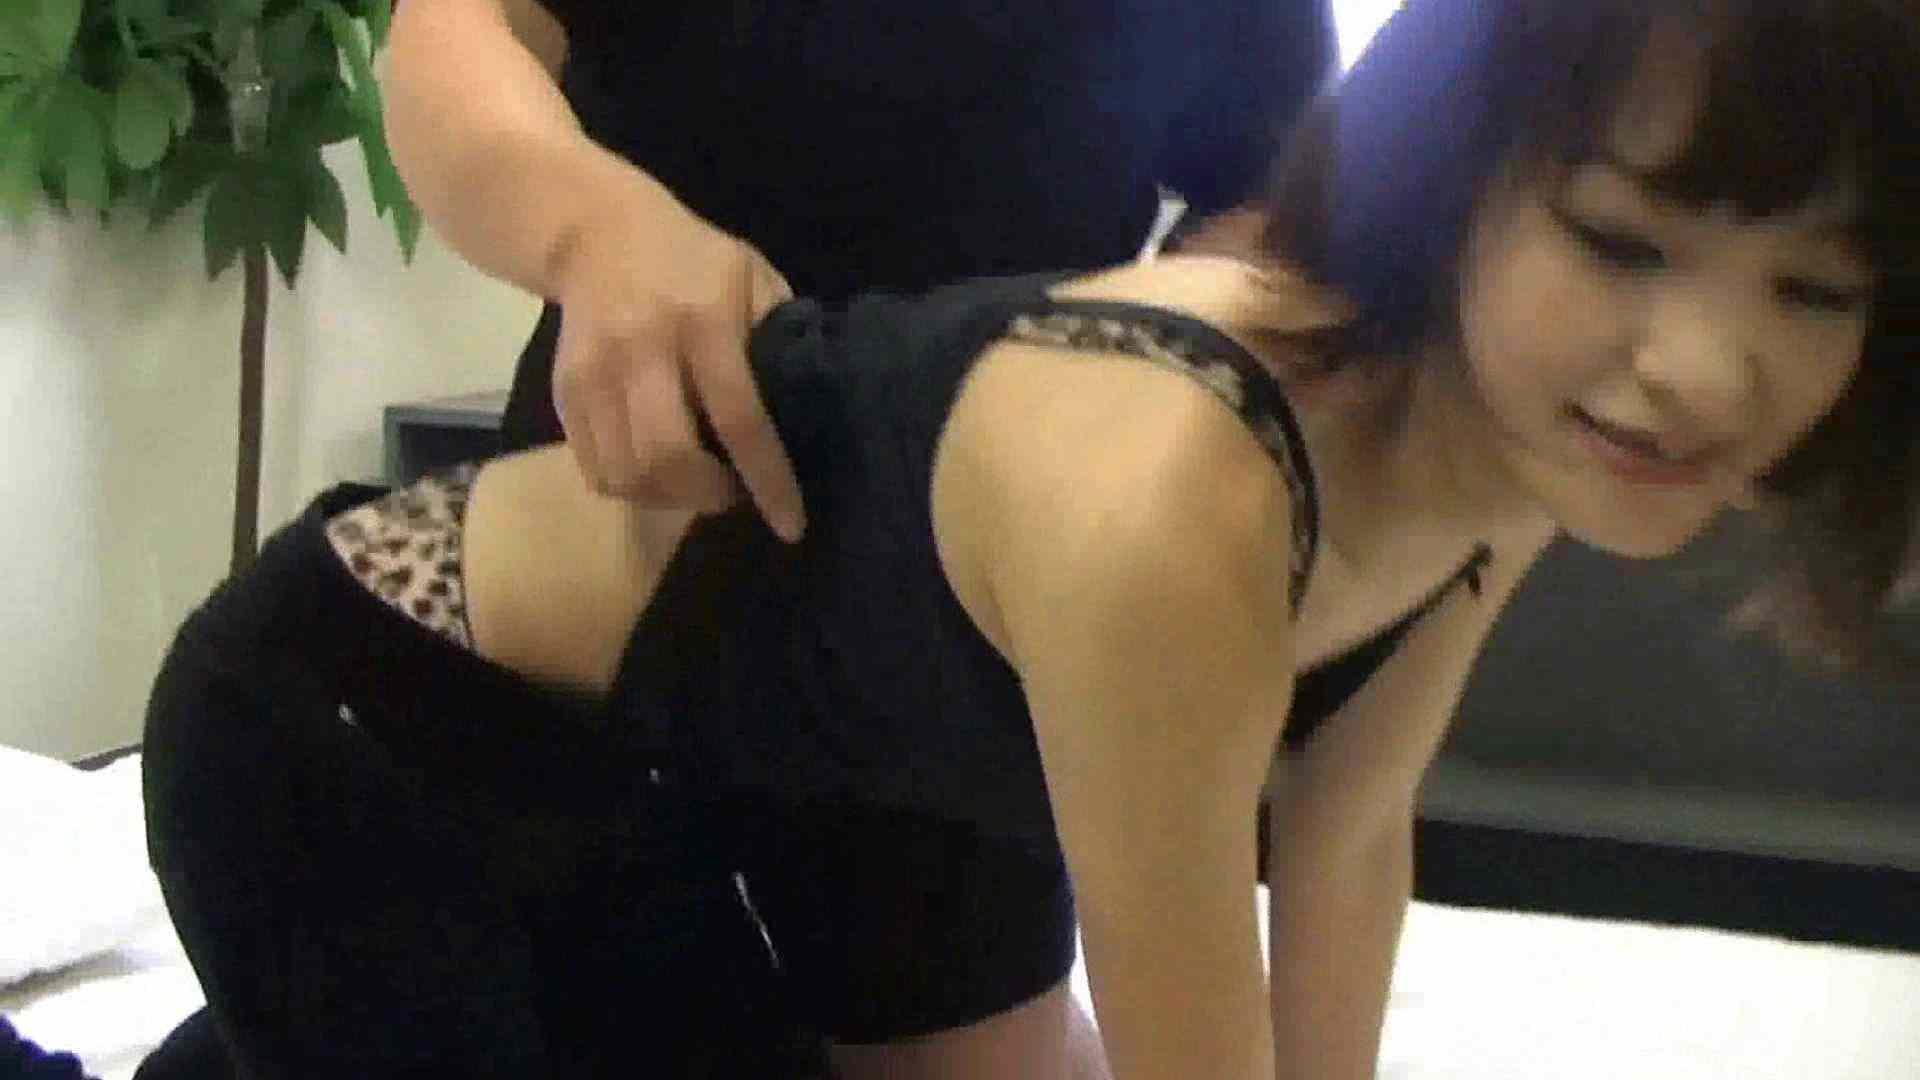 S級厳選美女ビッチガールVol.26 ギャルの実態 | 貧乳  78pic 25